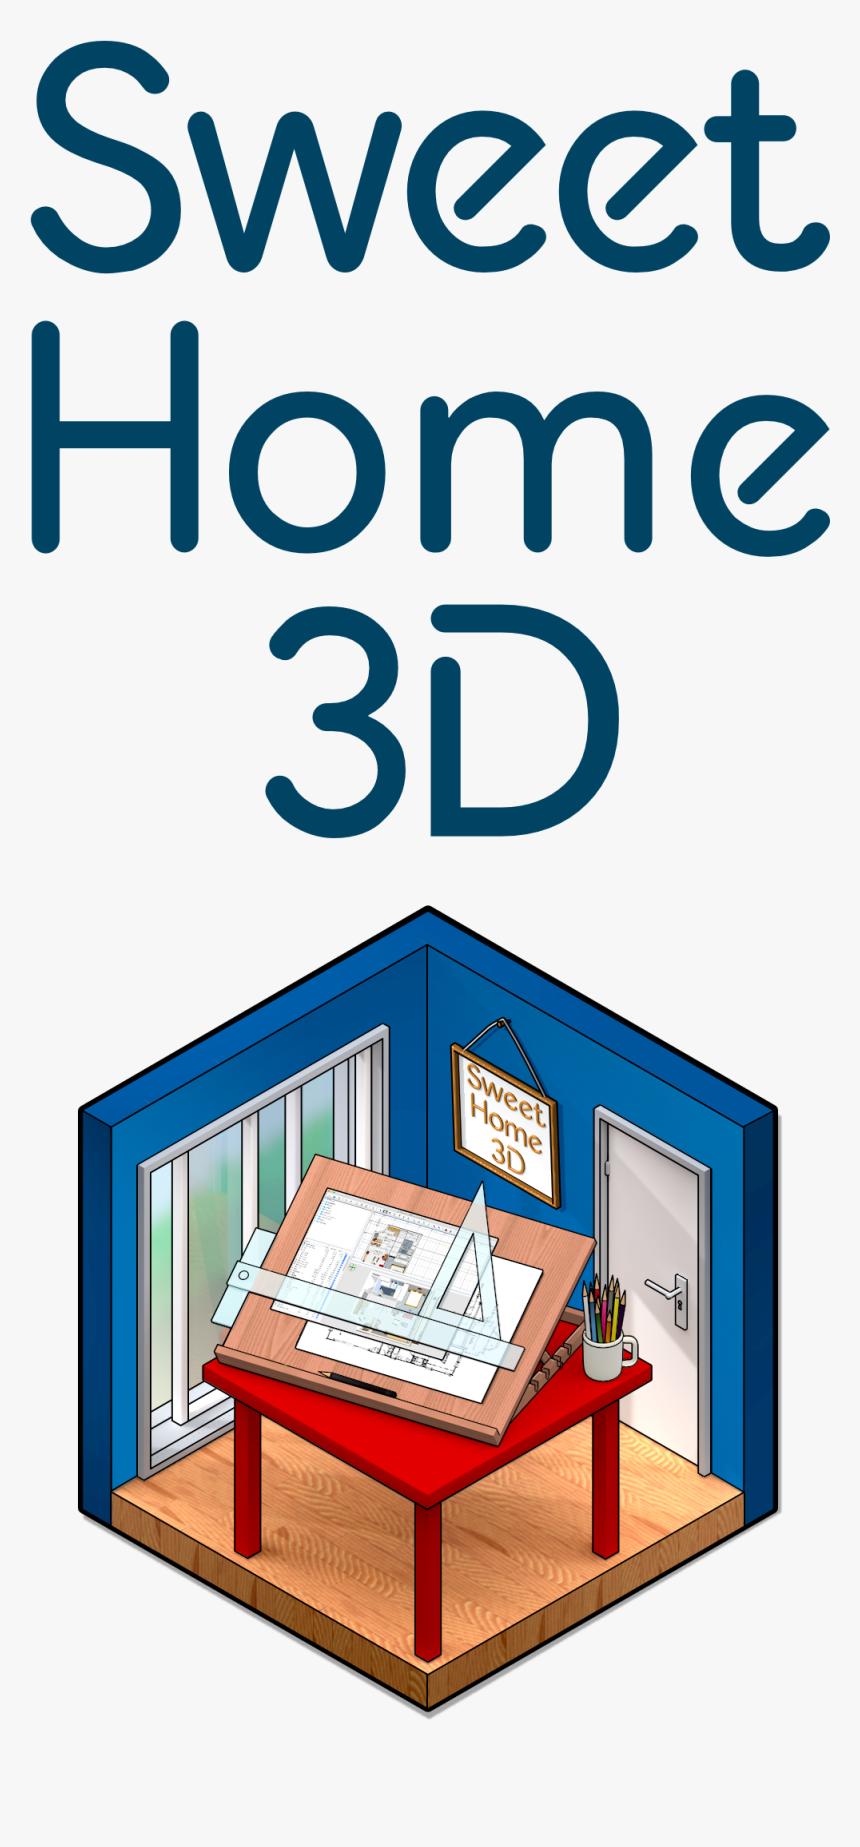 شراء Sweet Home 3d - Sweet Home 3d Icon, HD Png Download, Free Download